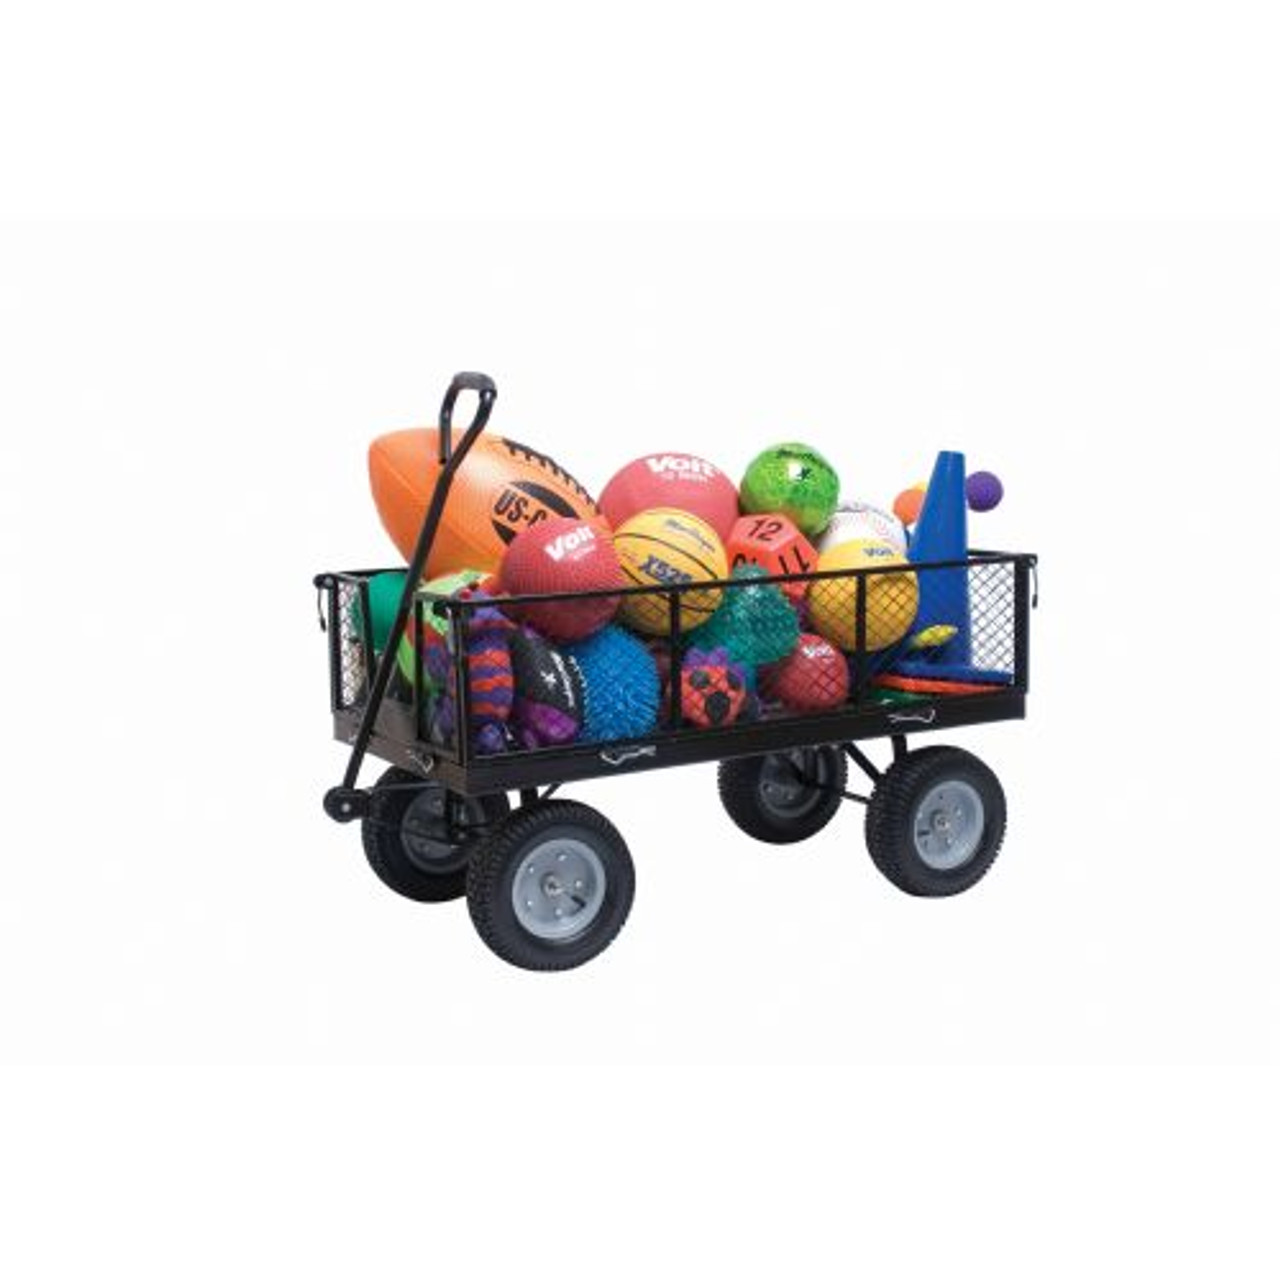 Multi-Purpose Equipment Wagon for football